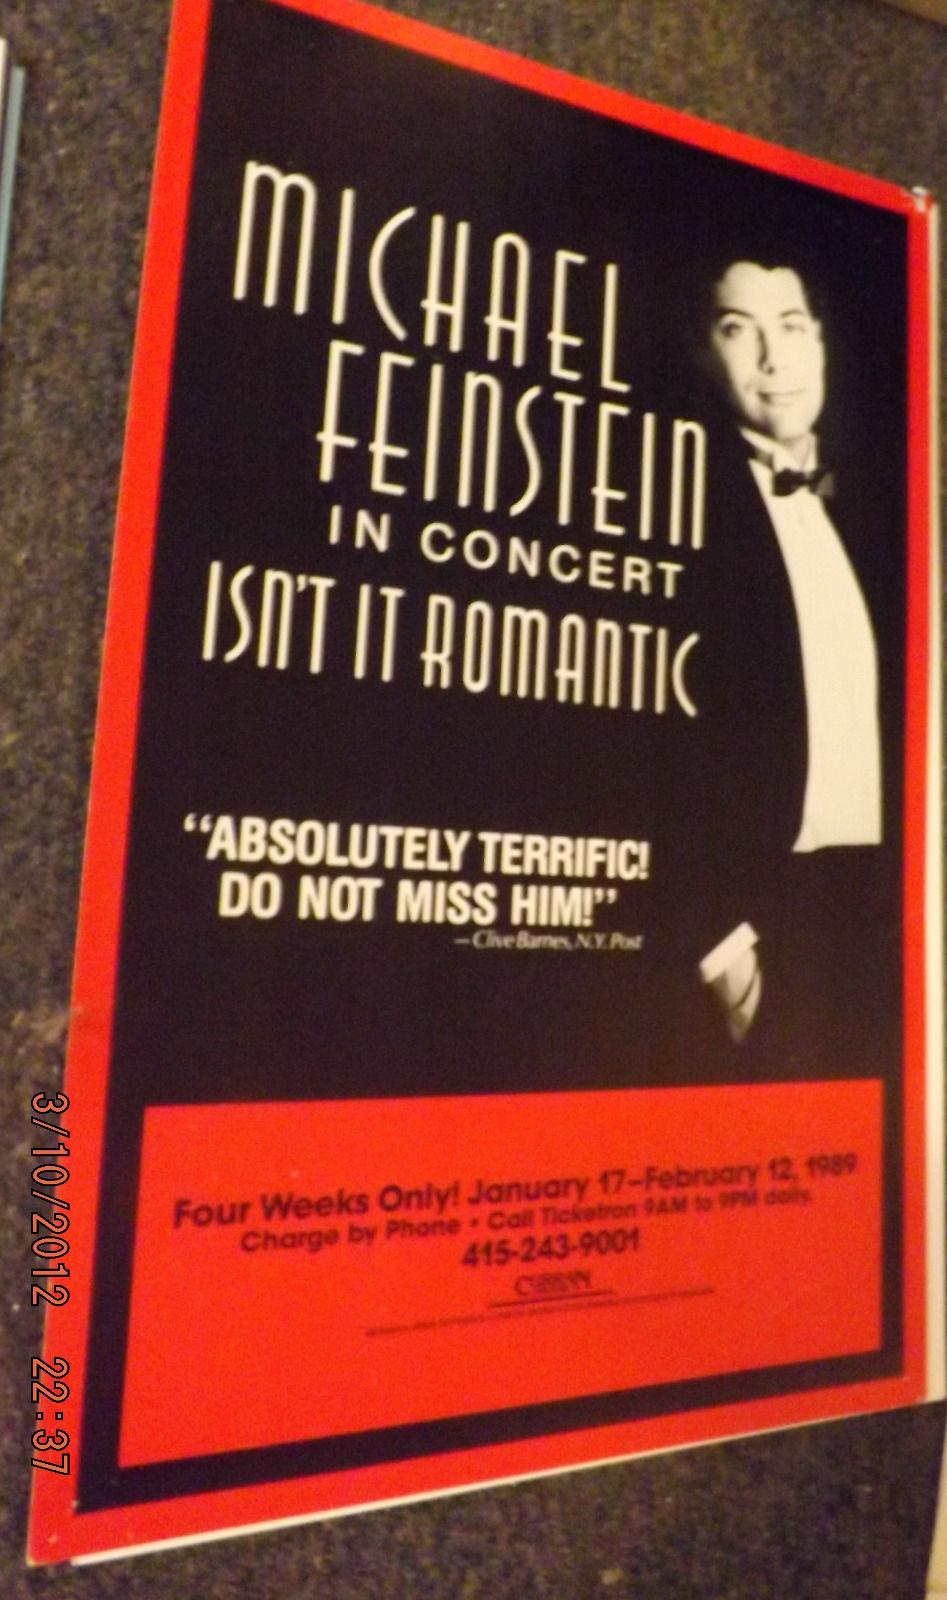 MICHAEL FEINSTEIN IN CONCERT POSTER - ISN'T IT ROMANIC - SF 1989